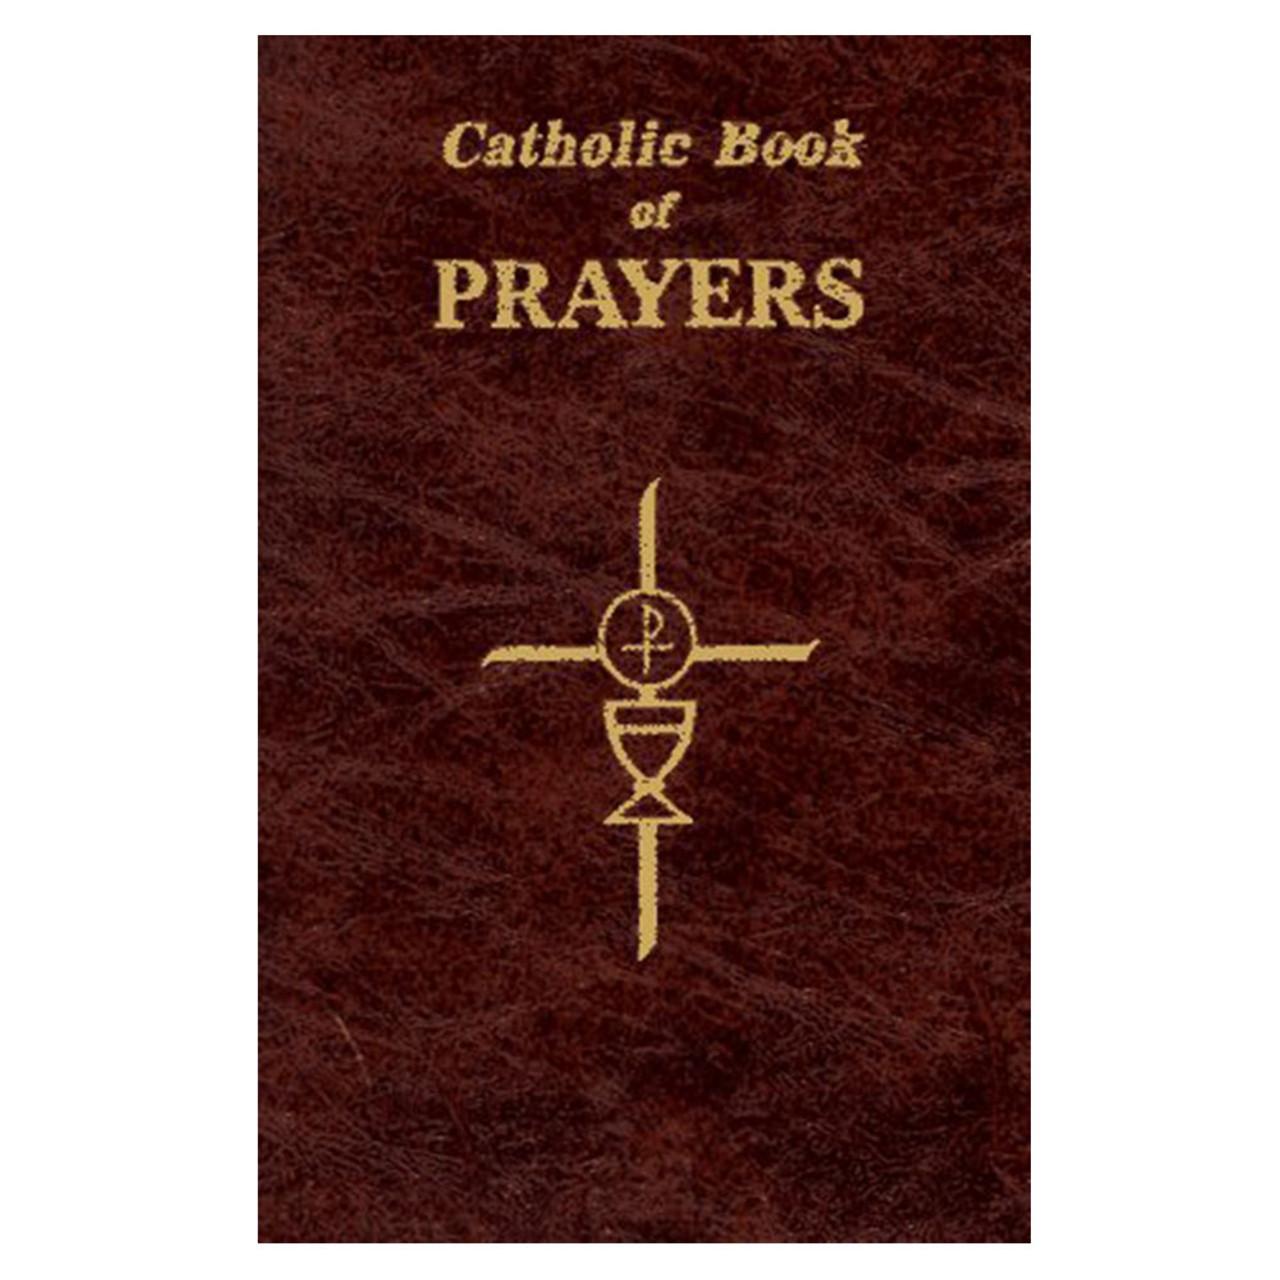 Large Print Catholic Book of Prayers